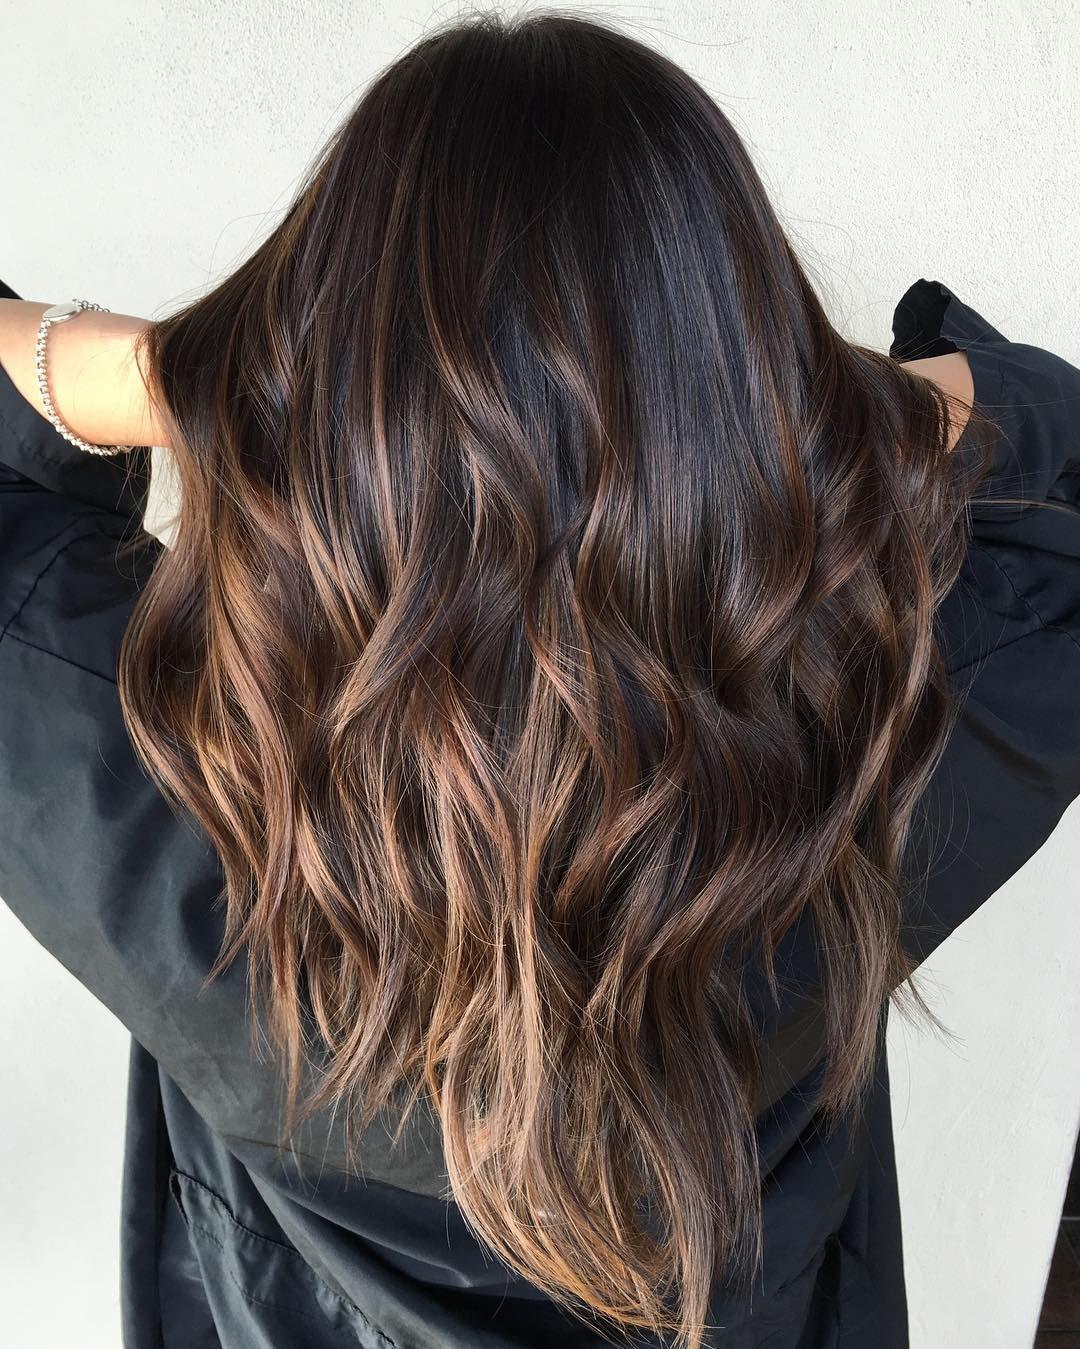 wavy hair | beauty | hair | pinterest | hair, hair styles und wavy hair